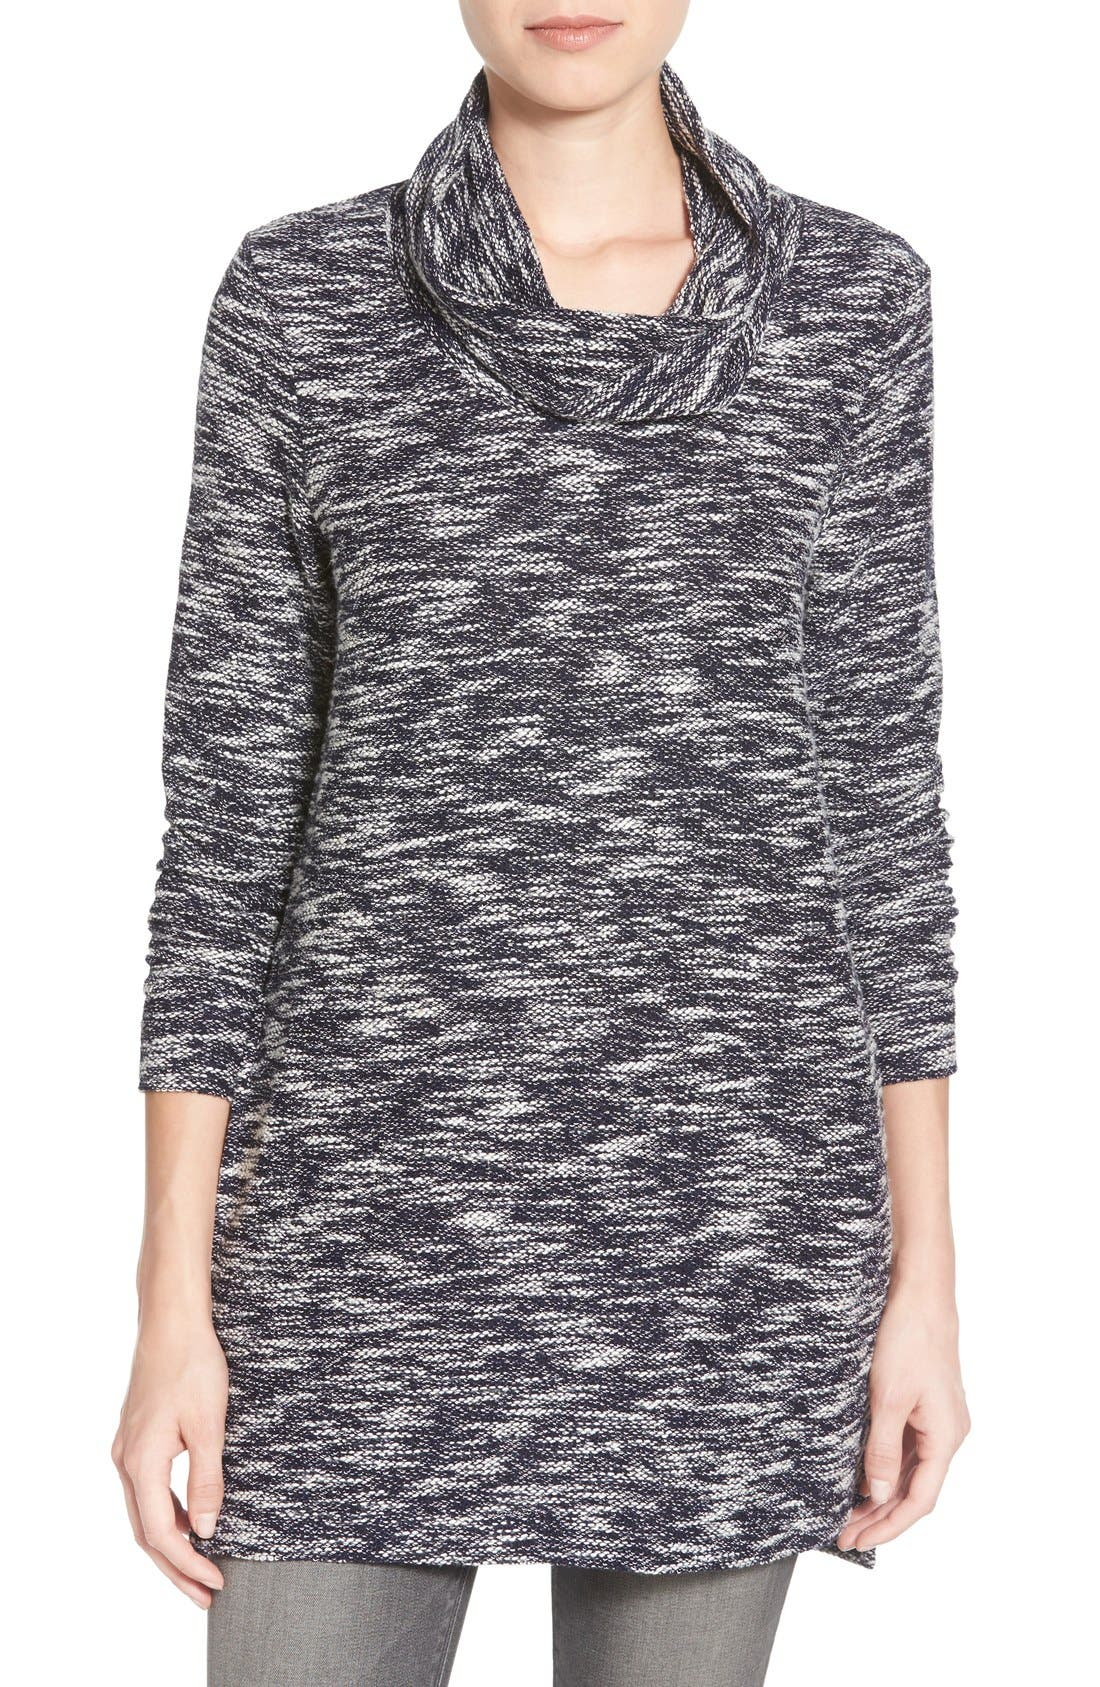 Alternate Image 1 Selected - Caslon® Knit Cowl Neck Tunic (Regular & Petite)